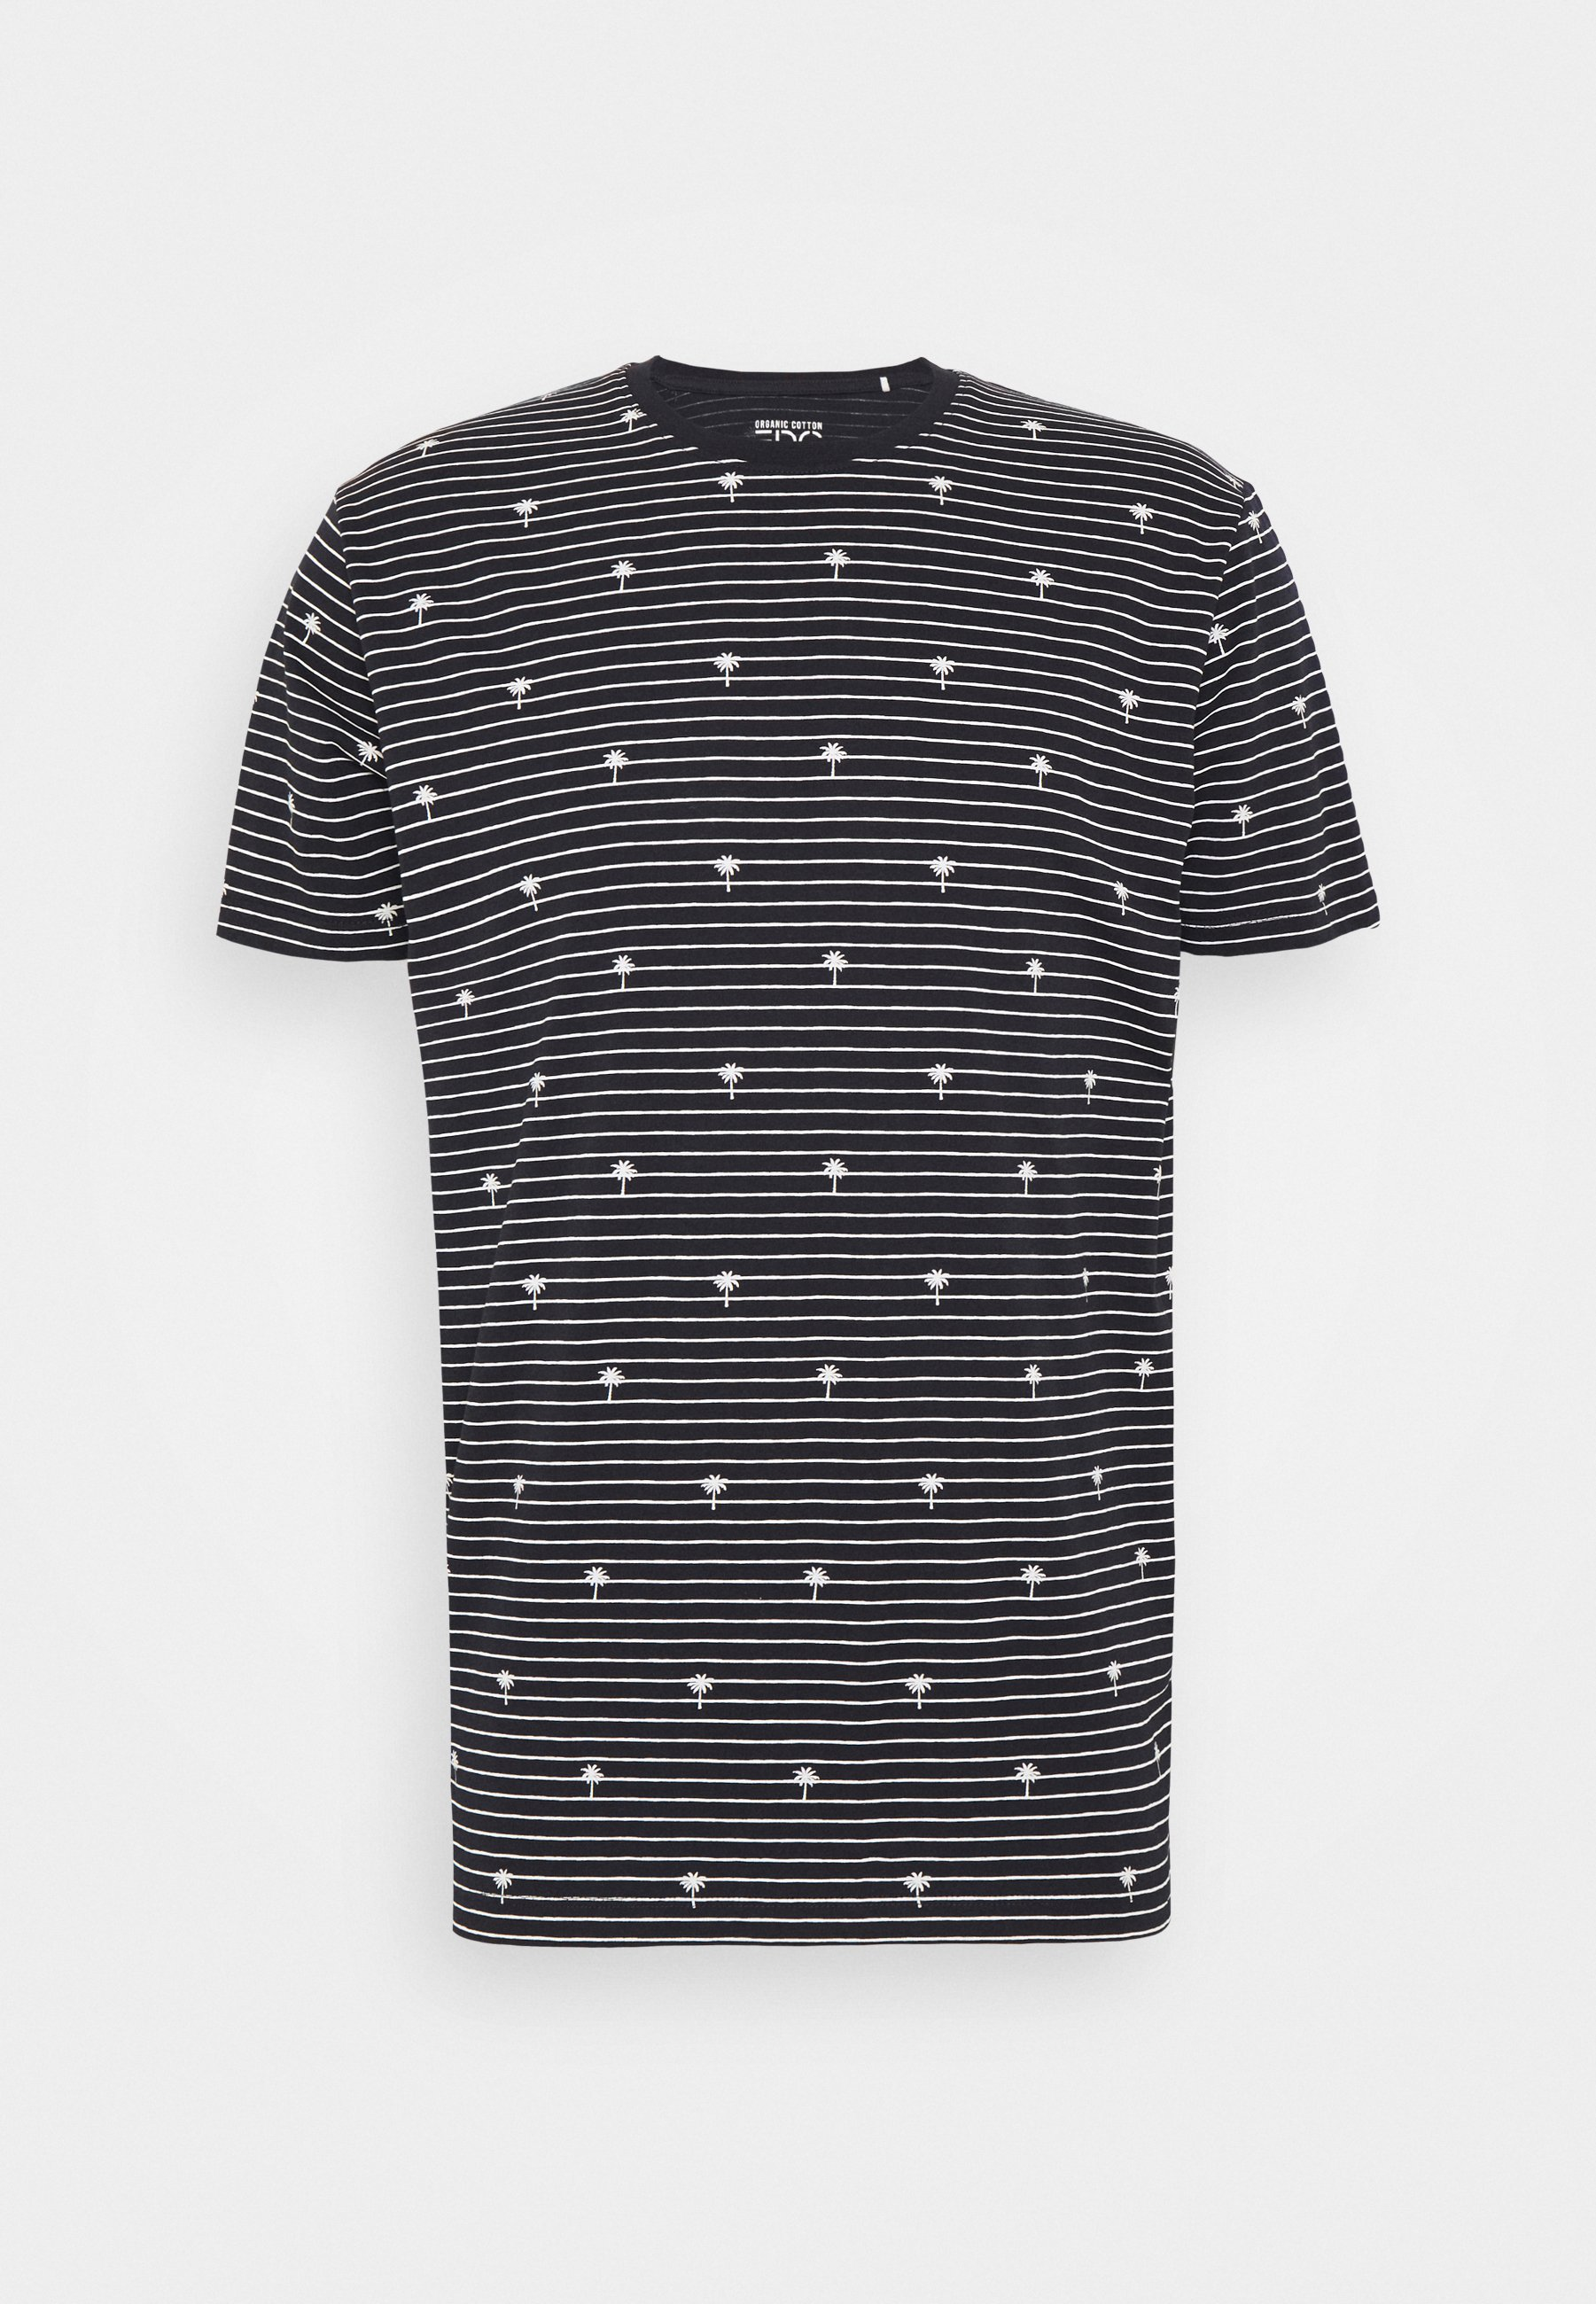 Esprit T shirt imprimé navy ZALANDO.FR